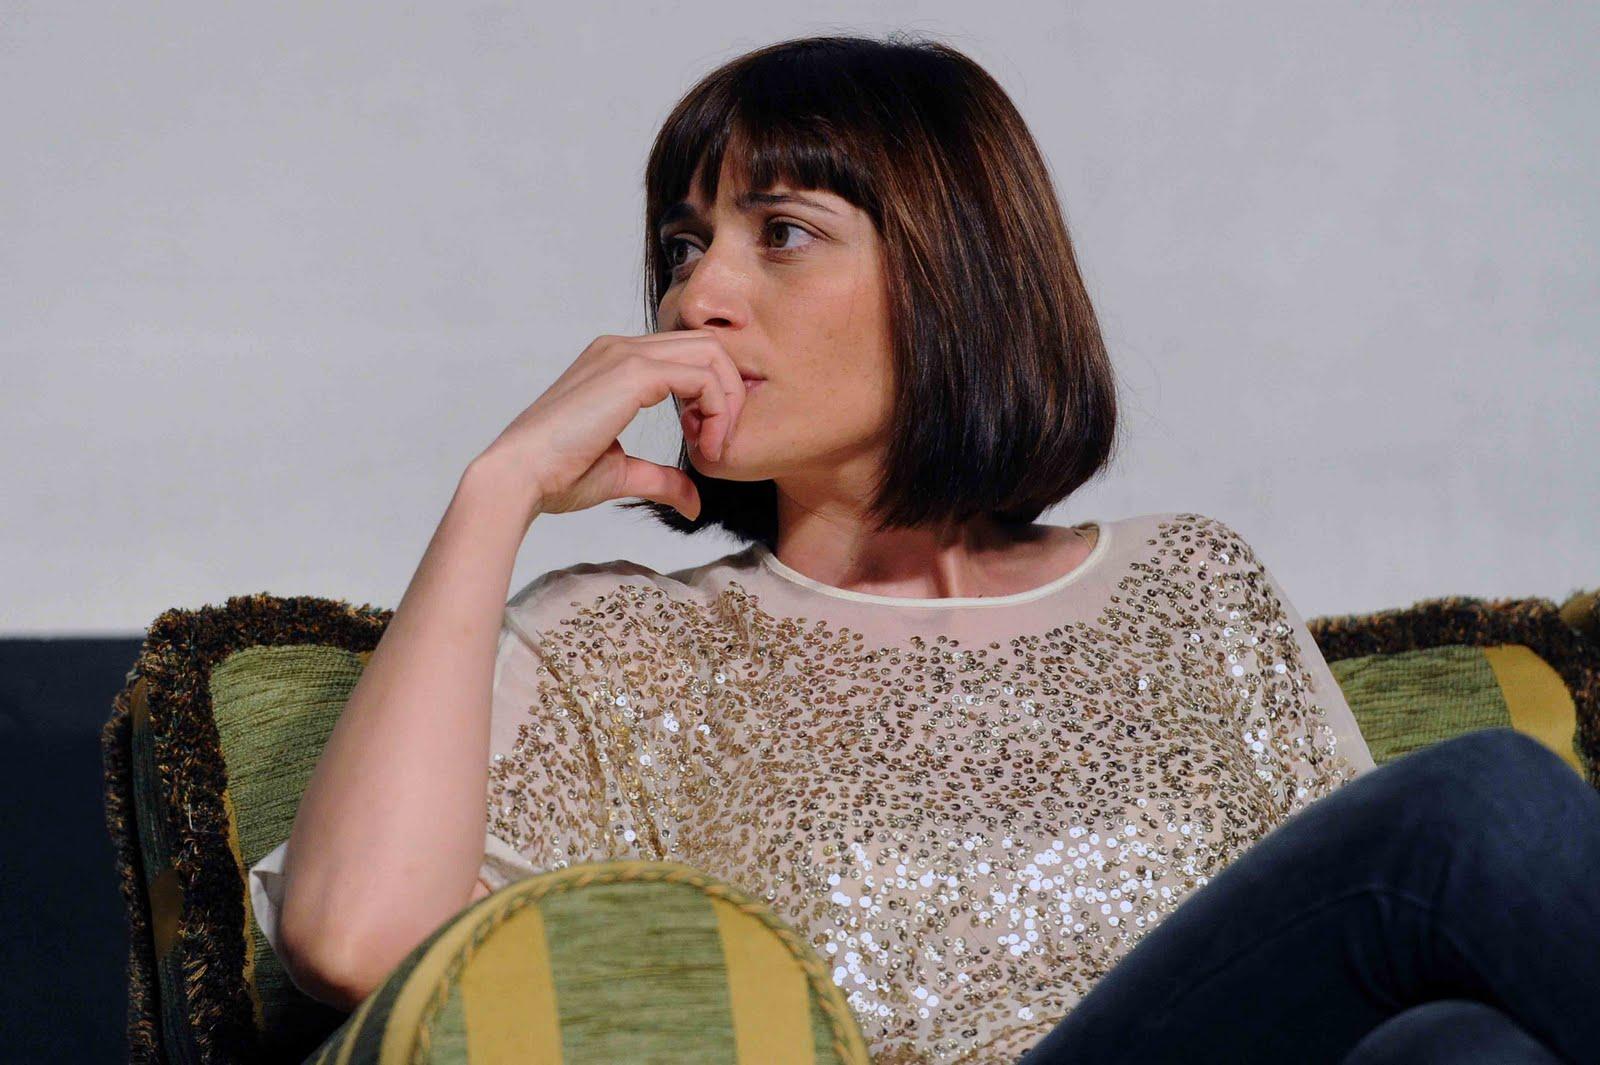 Natassia malthe bloodrayne beautiful lesbian scene cute actress